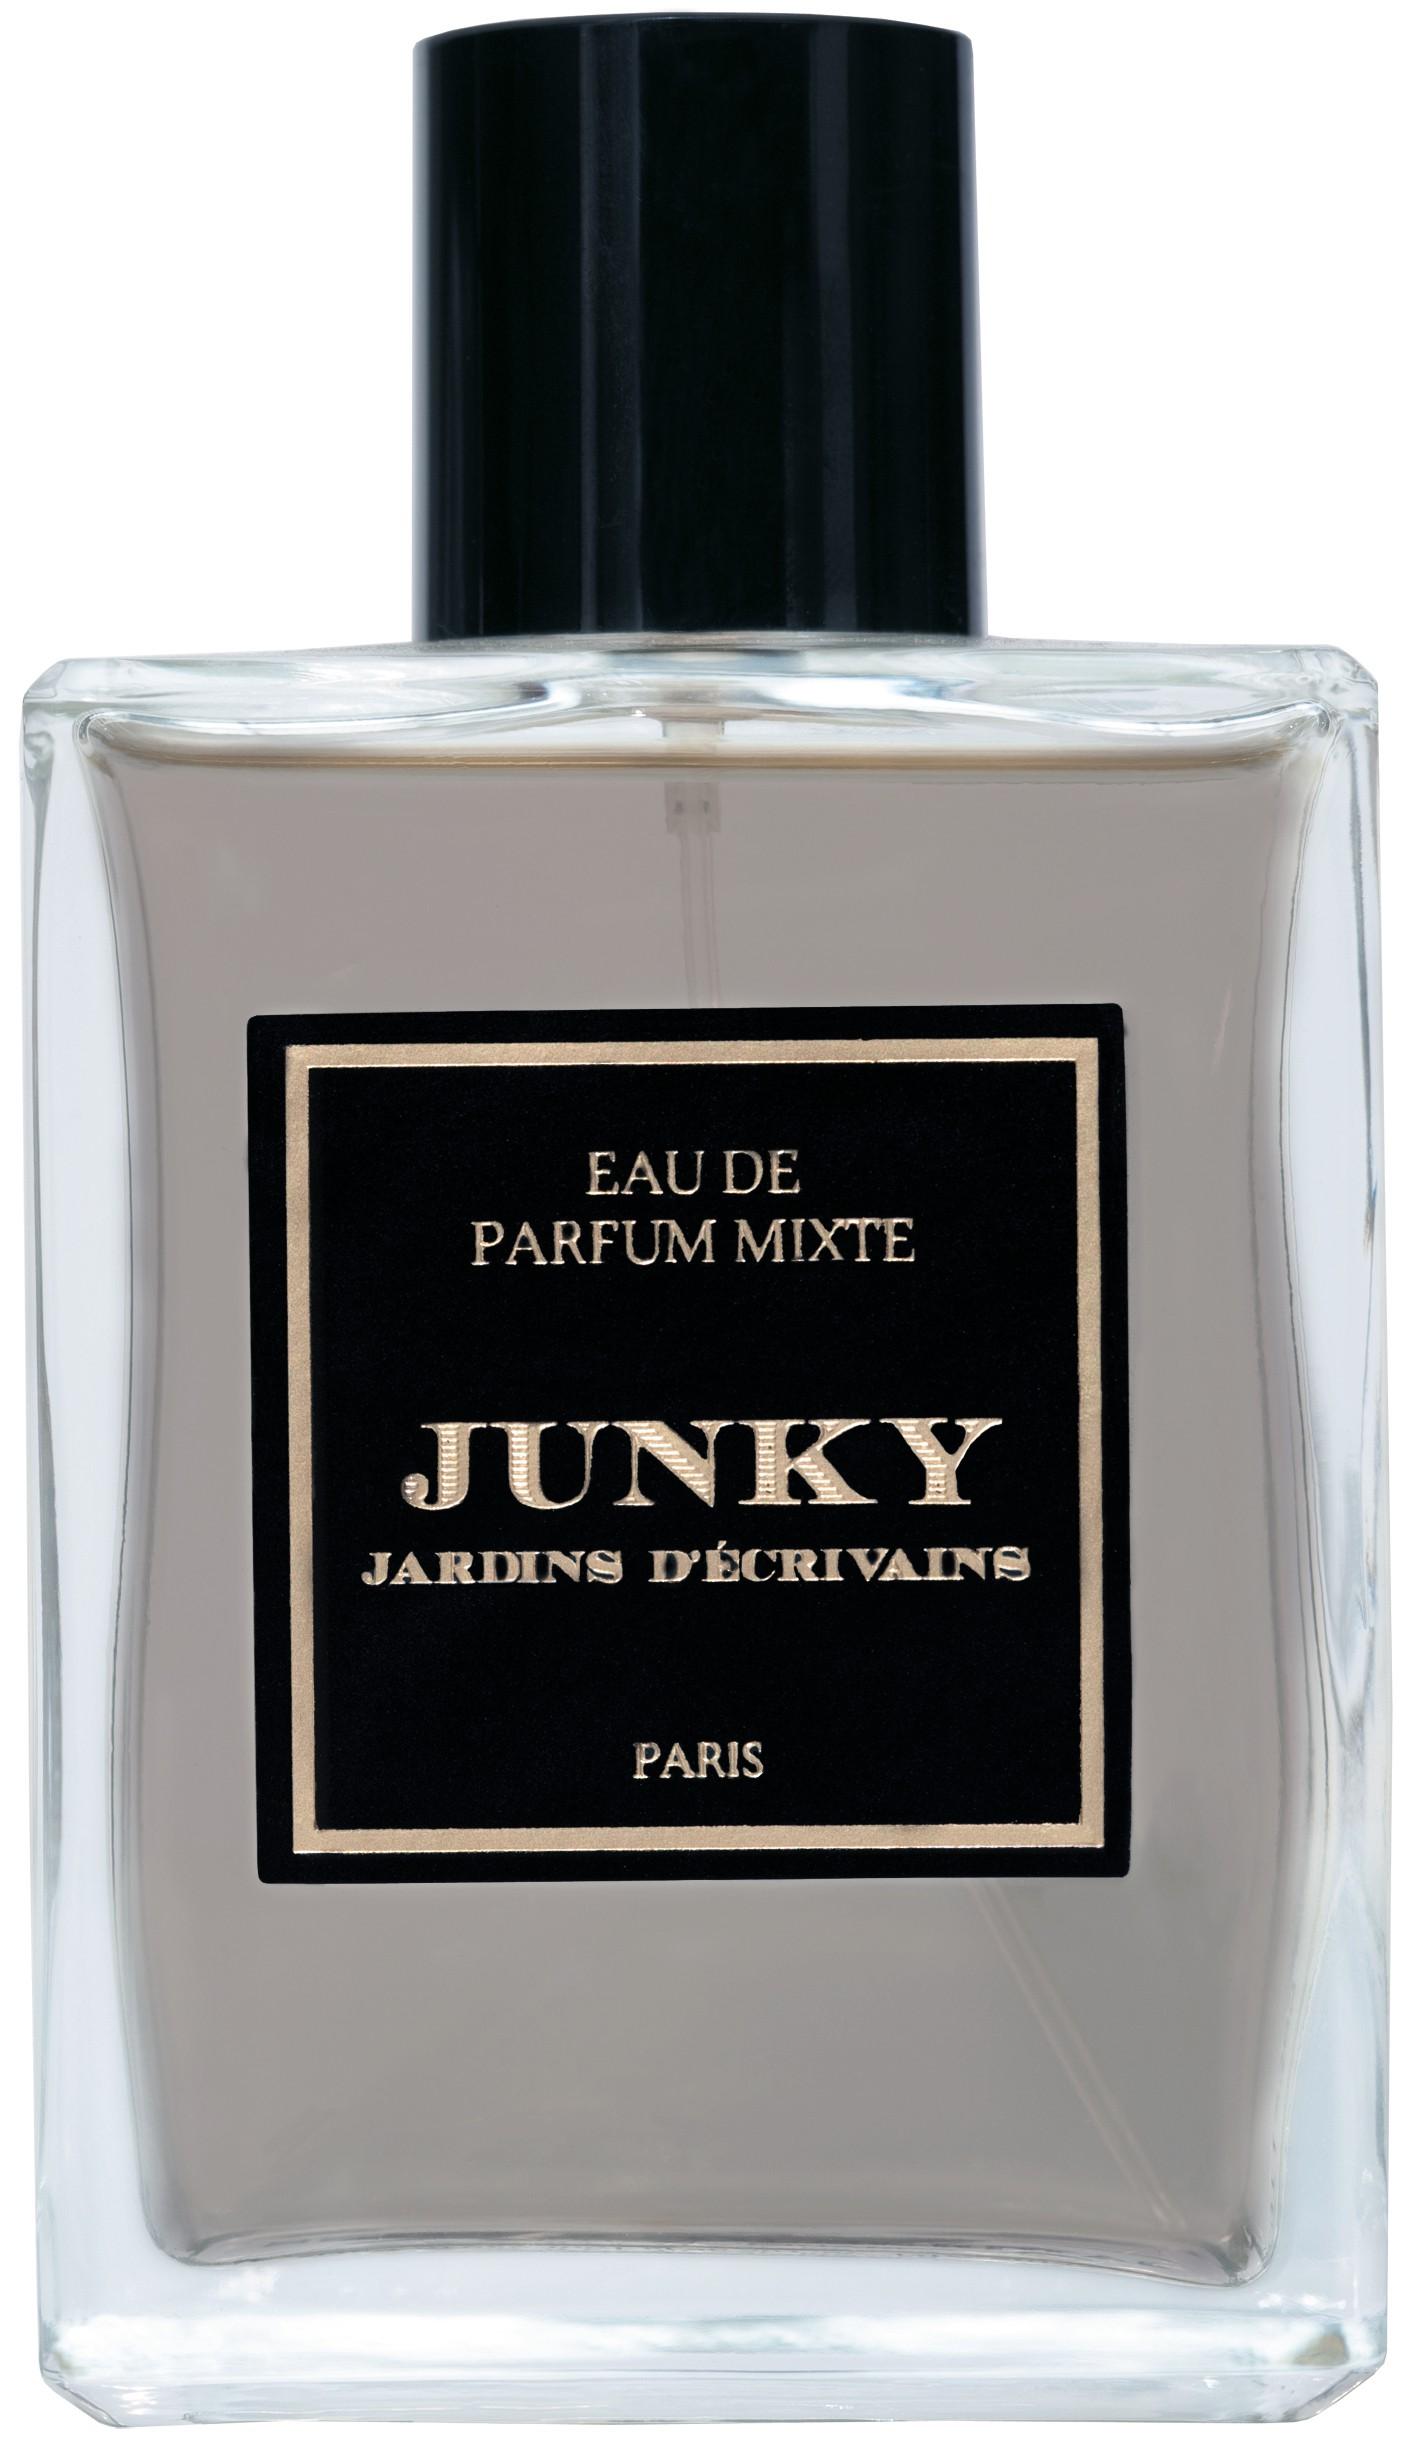 Jardins D'Ecrivains Junky аромат для мужчин и женщин